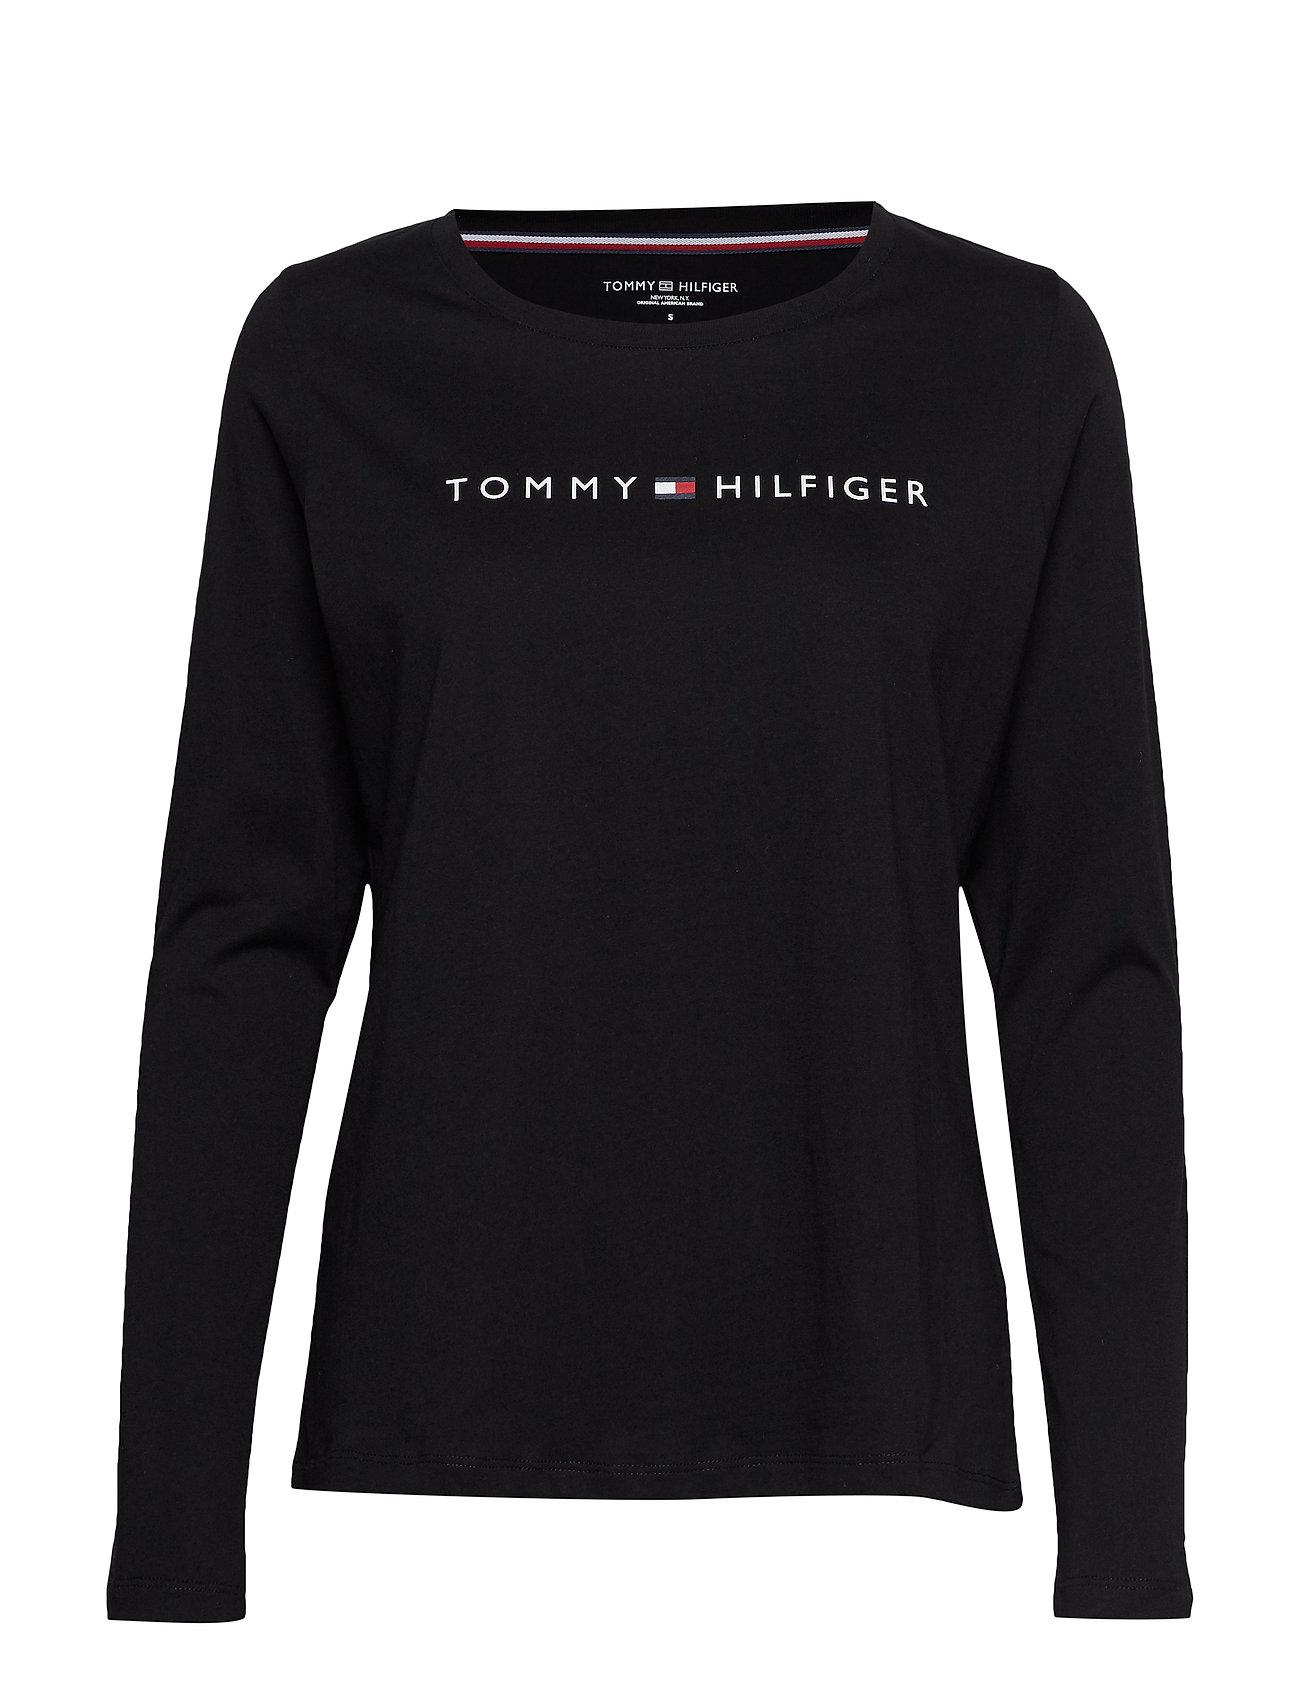 Tommy Hilfiger CN TEE LS LOGO - BLACK